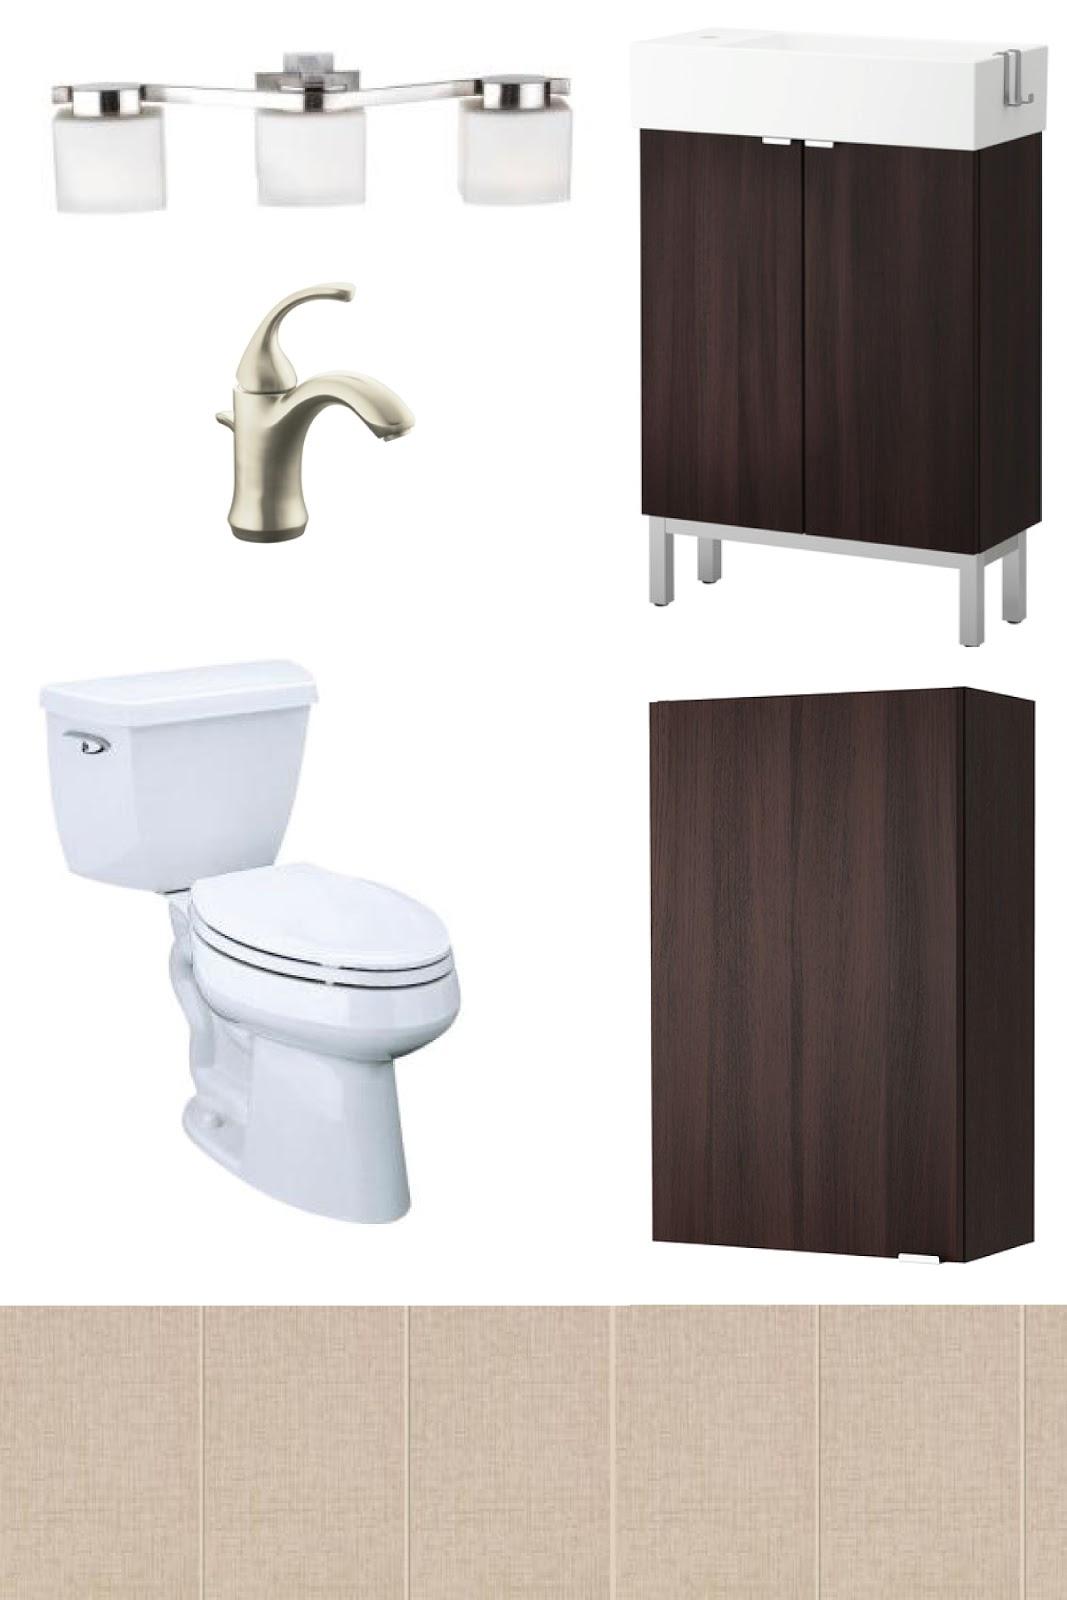 Zoo view home bathroom options for Zoo bathroom decor